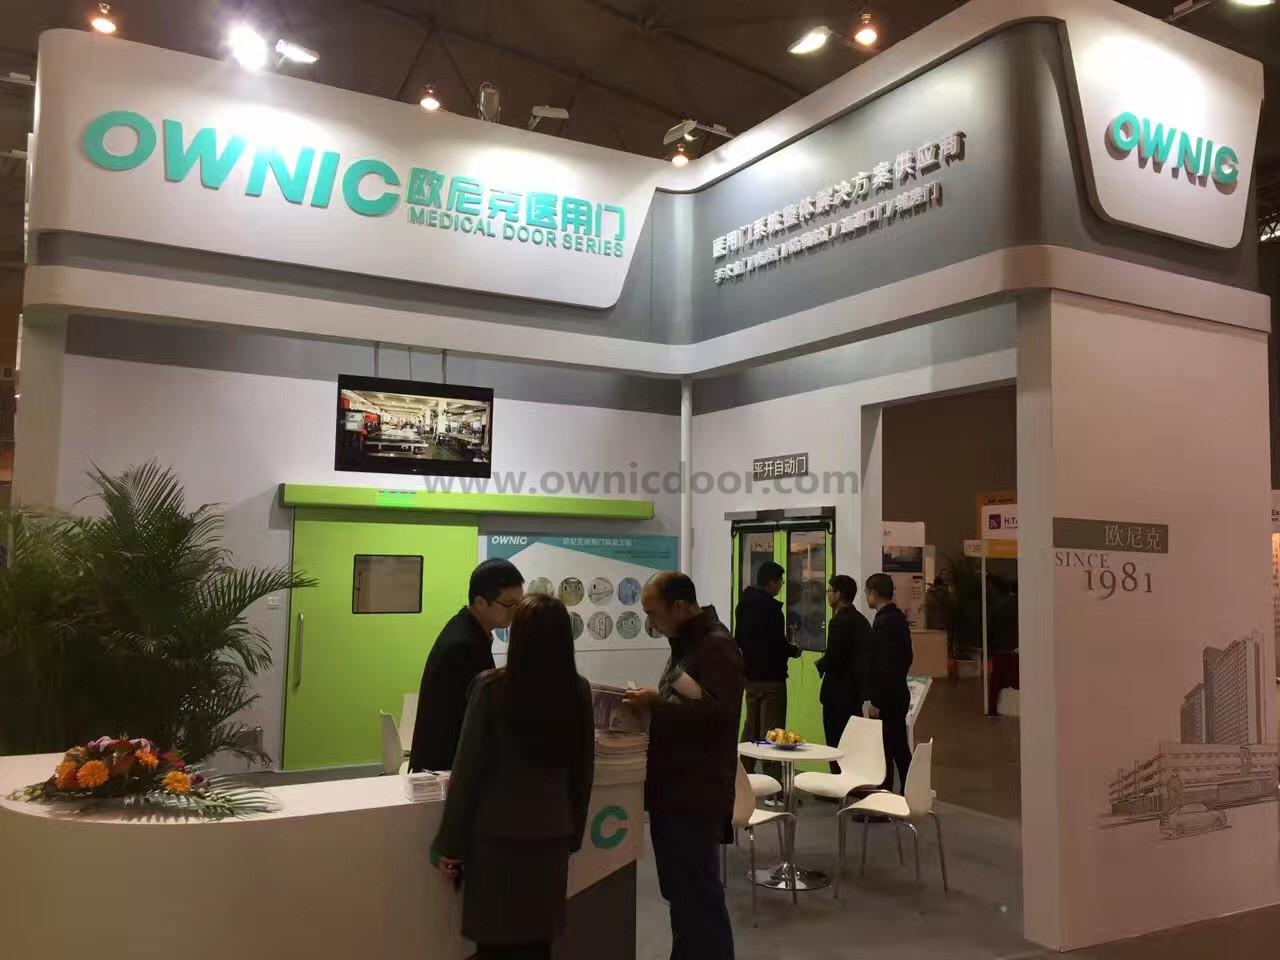 2017.3. Chengdu Western Medtec Conference